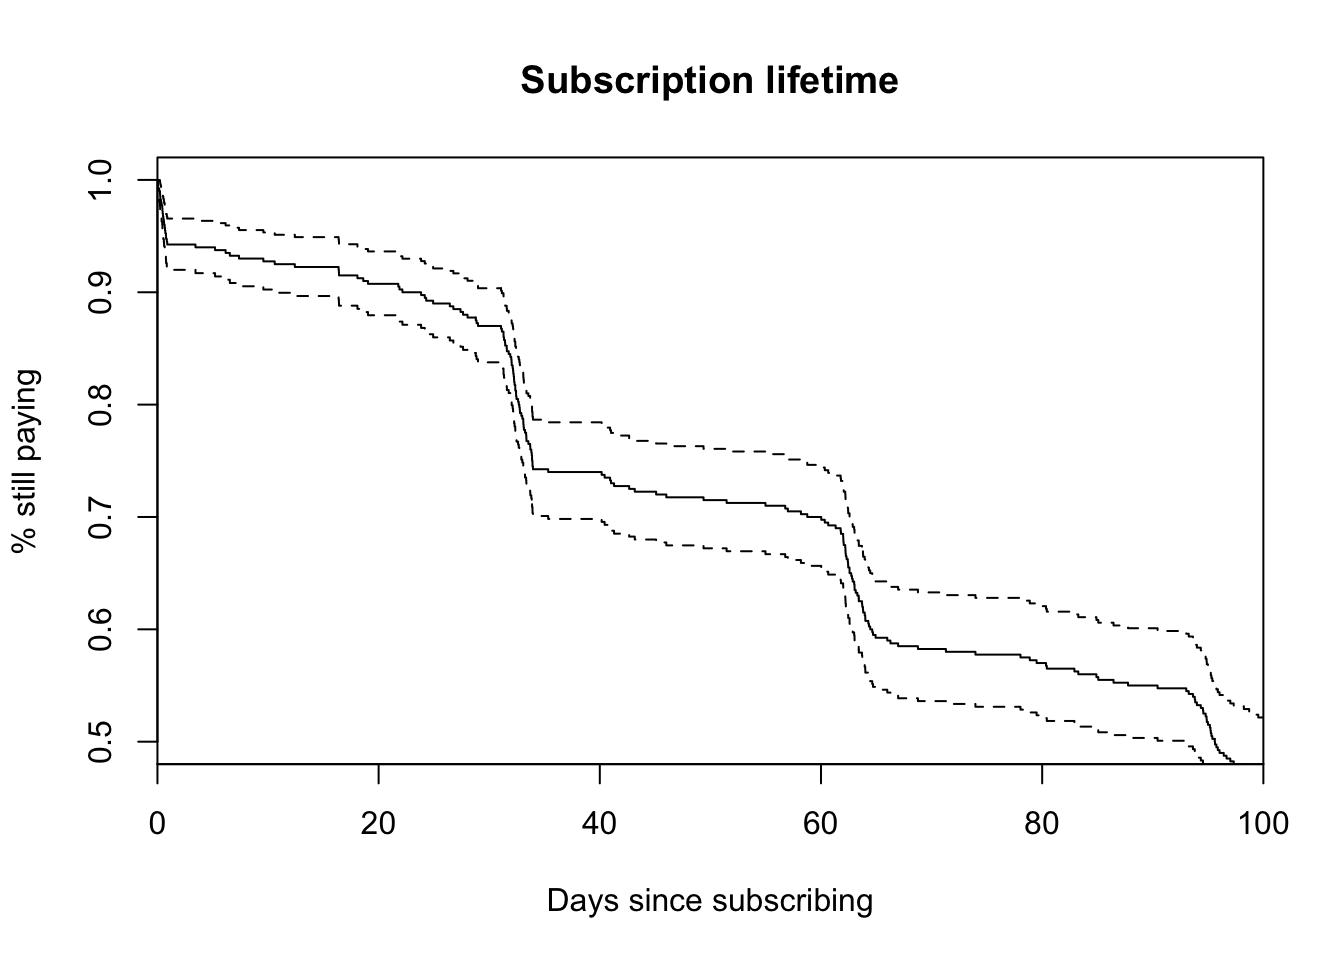 Modeling subscription churn